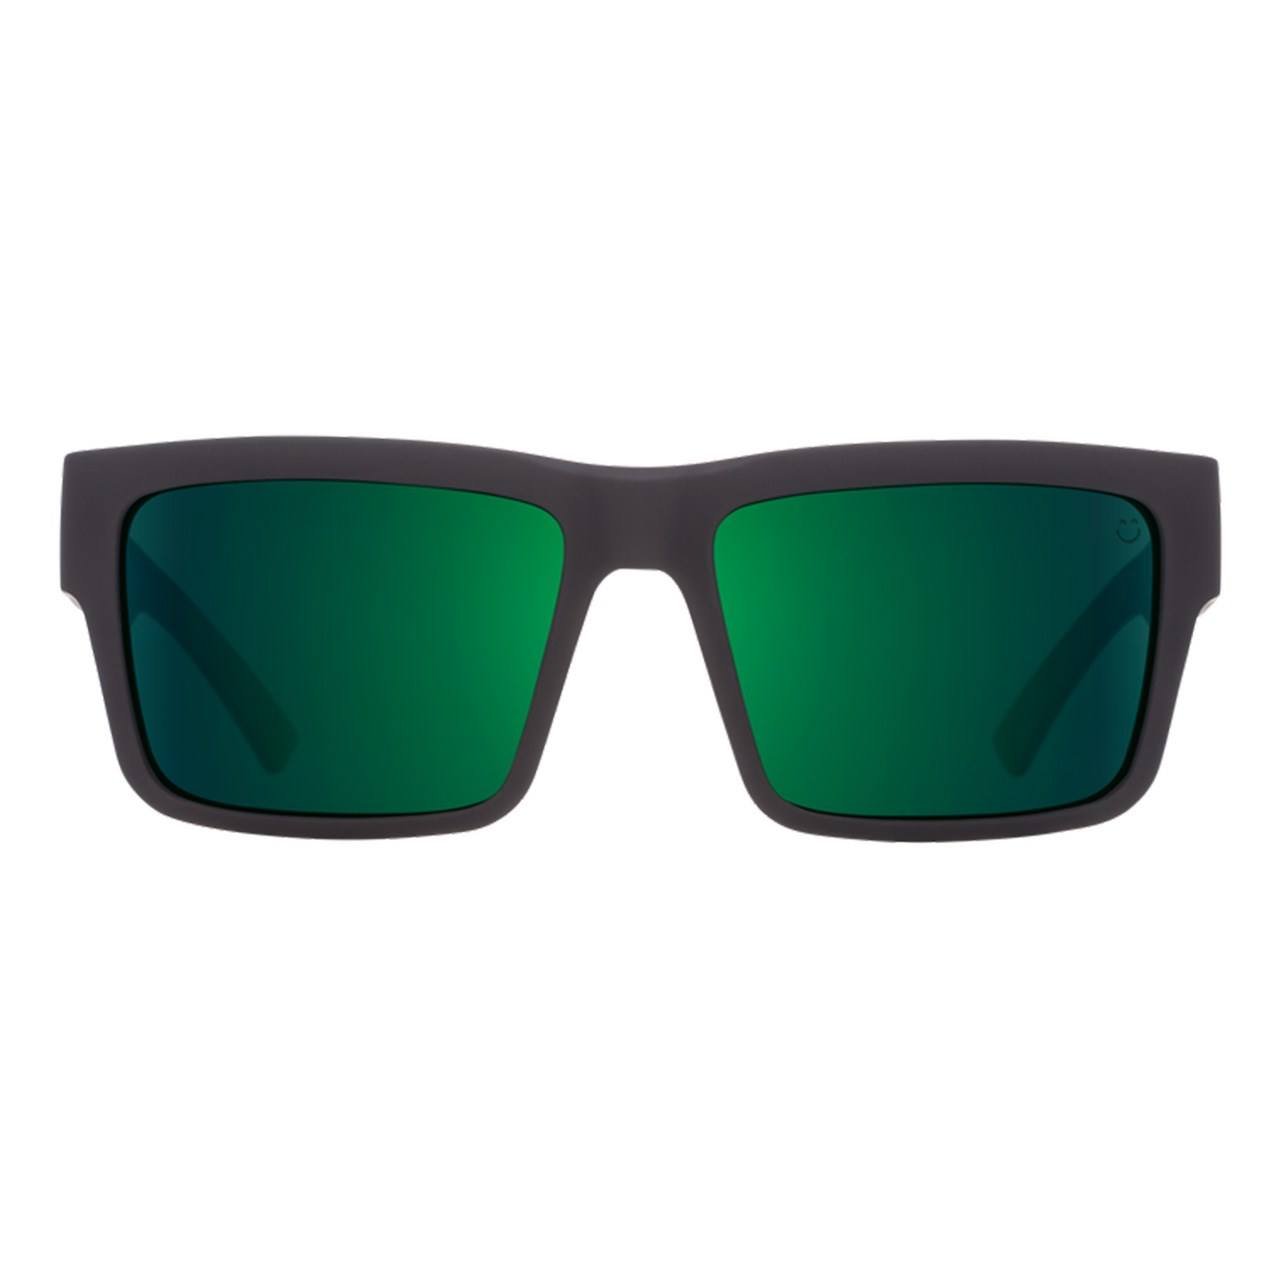 عینک آفتابی اسپای سری Montana سری Soft Matte Black Green Fade Happy Gray Green Green Flash -  - 1